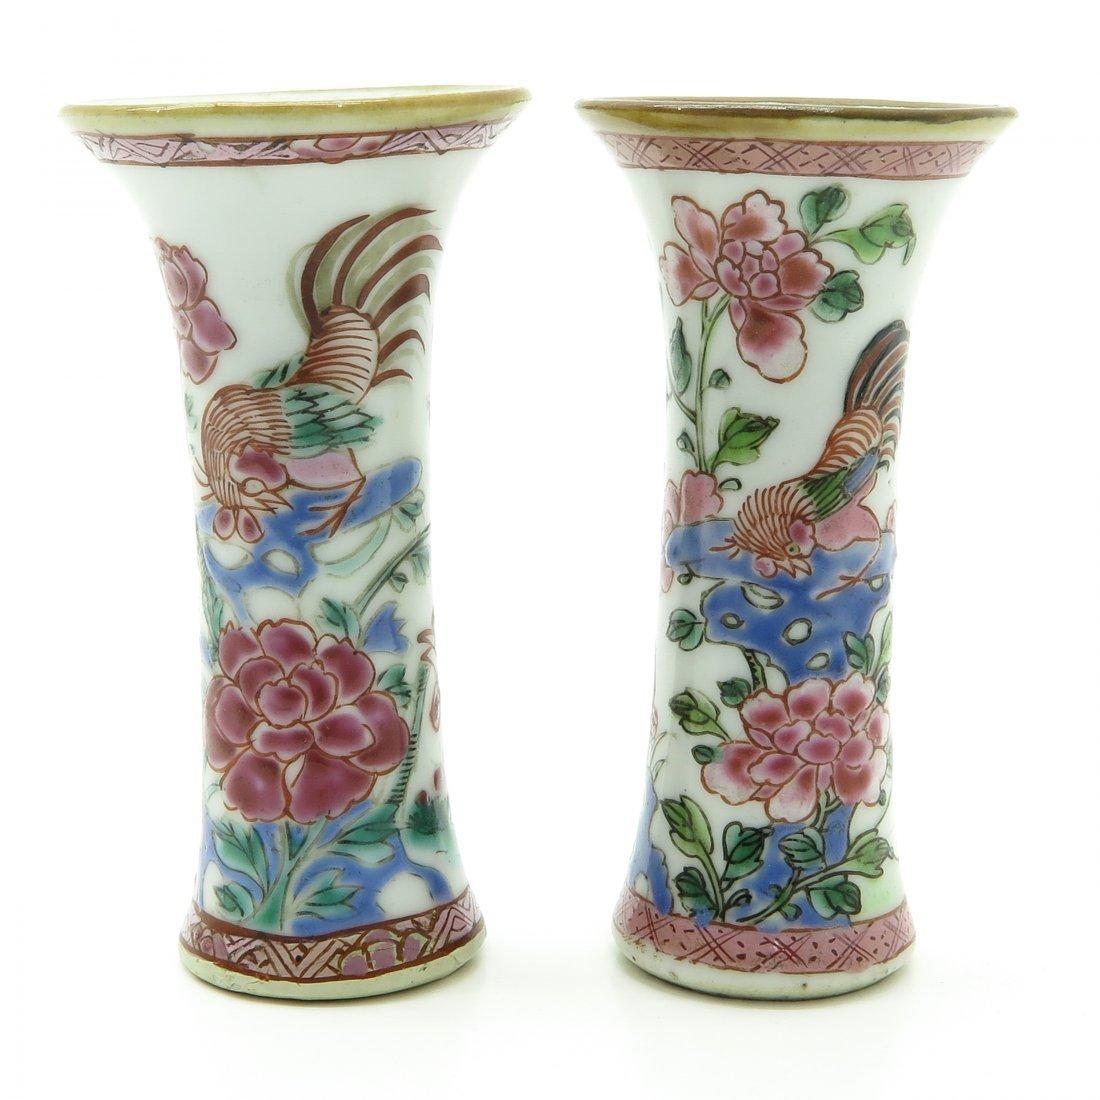 Lot of 2 China Porcelain Miniature Vases - 4